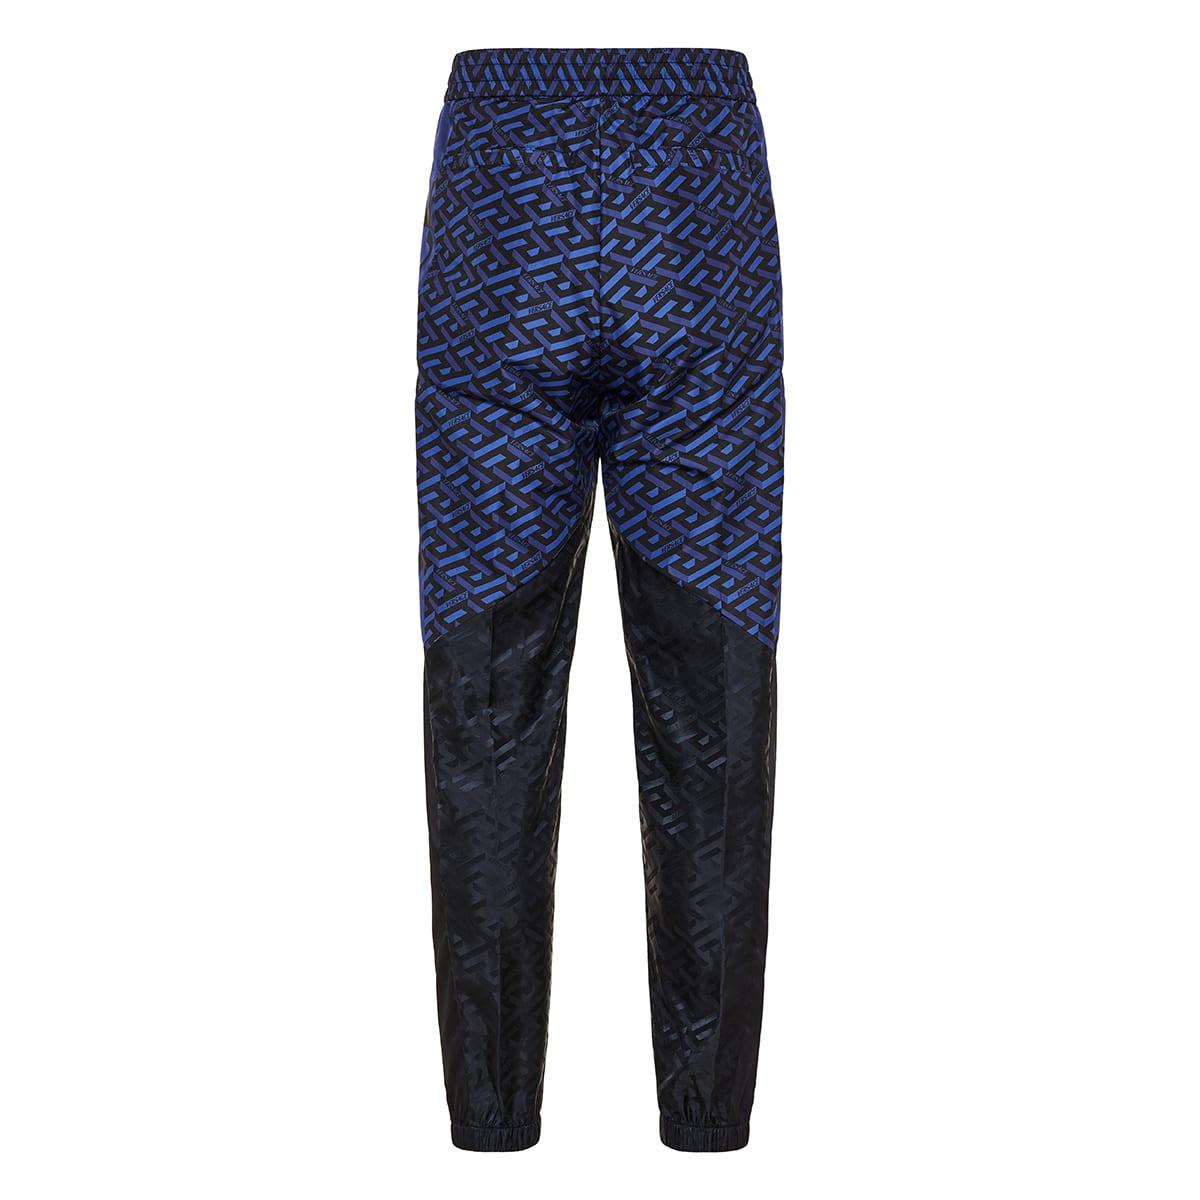 La Greca jacquard track trousers